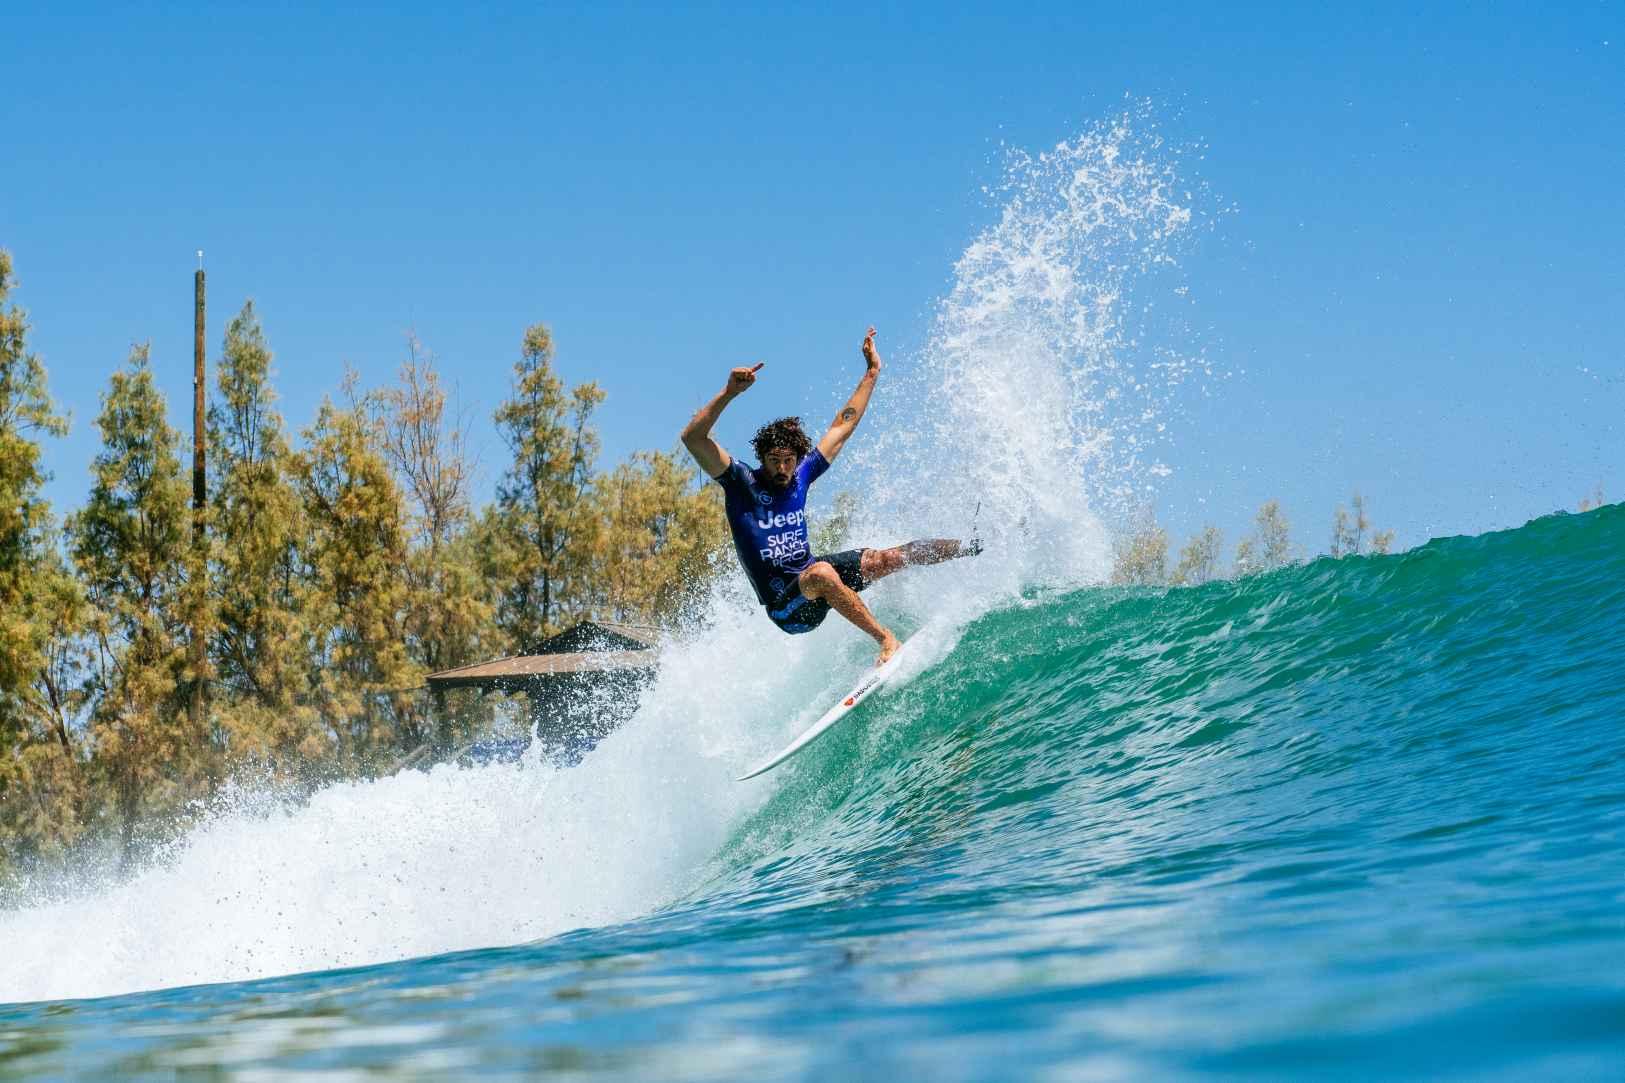 surf30 surf ranch pro 2021 wsl surf Dora Y Ranch21 PNN 2610